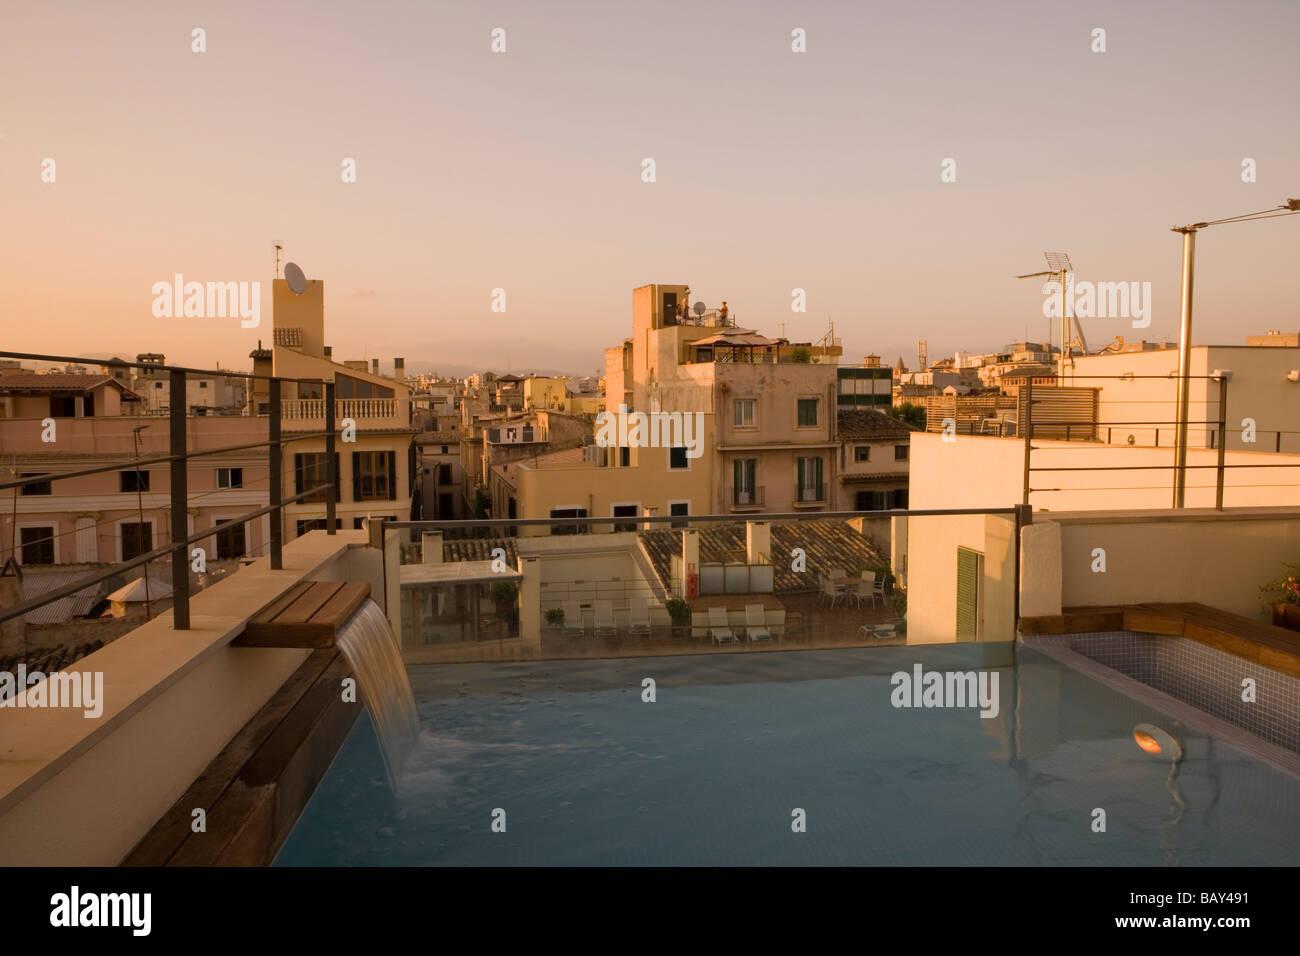 Hotel Tres Rooftop Plunge Pool at Dusk, Palma de Mallorca, Mallorca, Balearic Islands, Spain - Stock Image